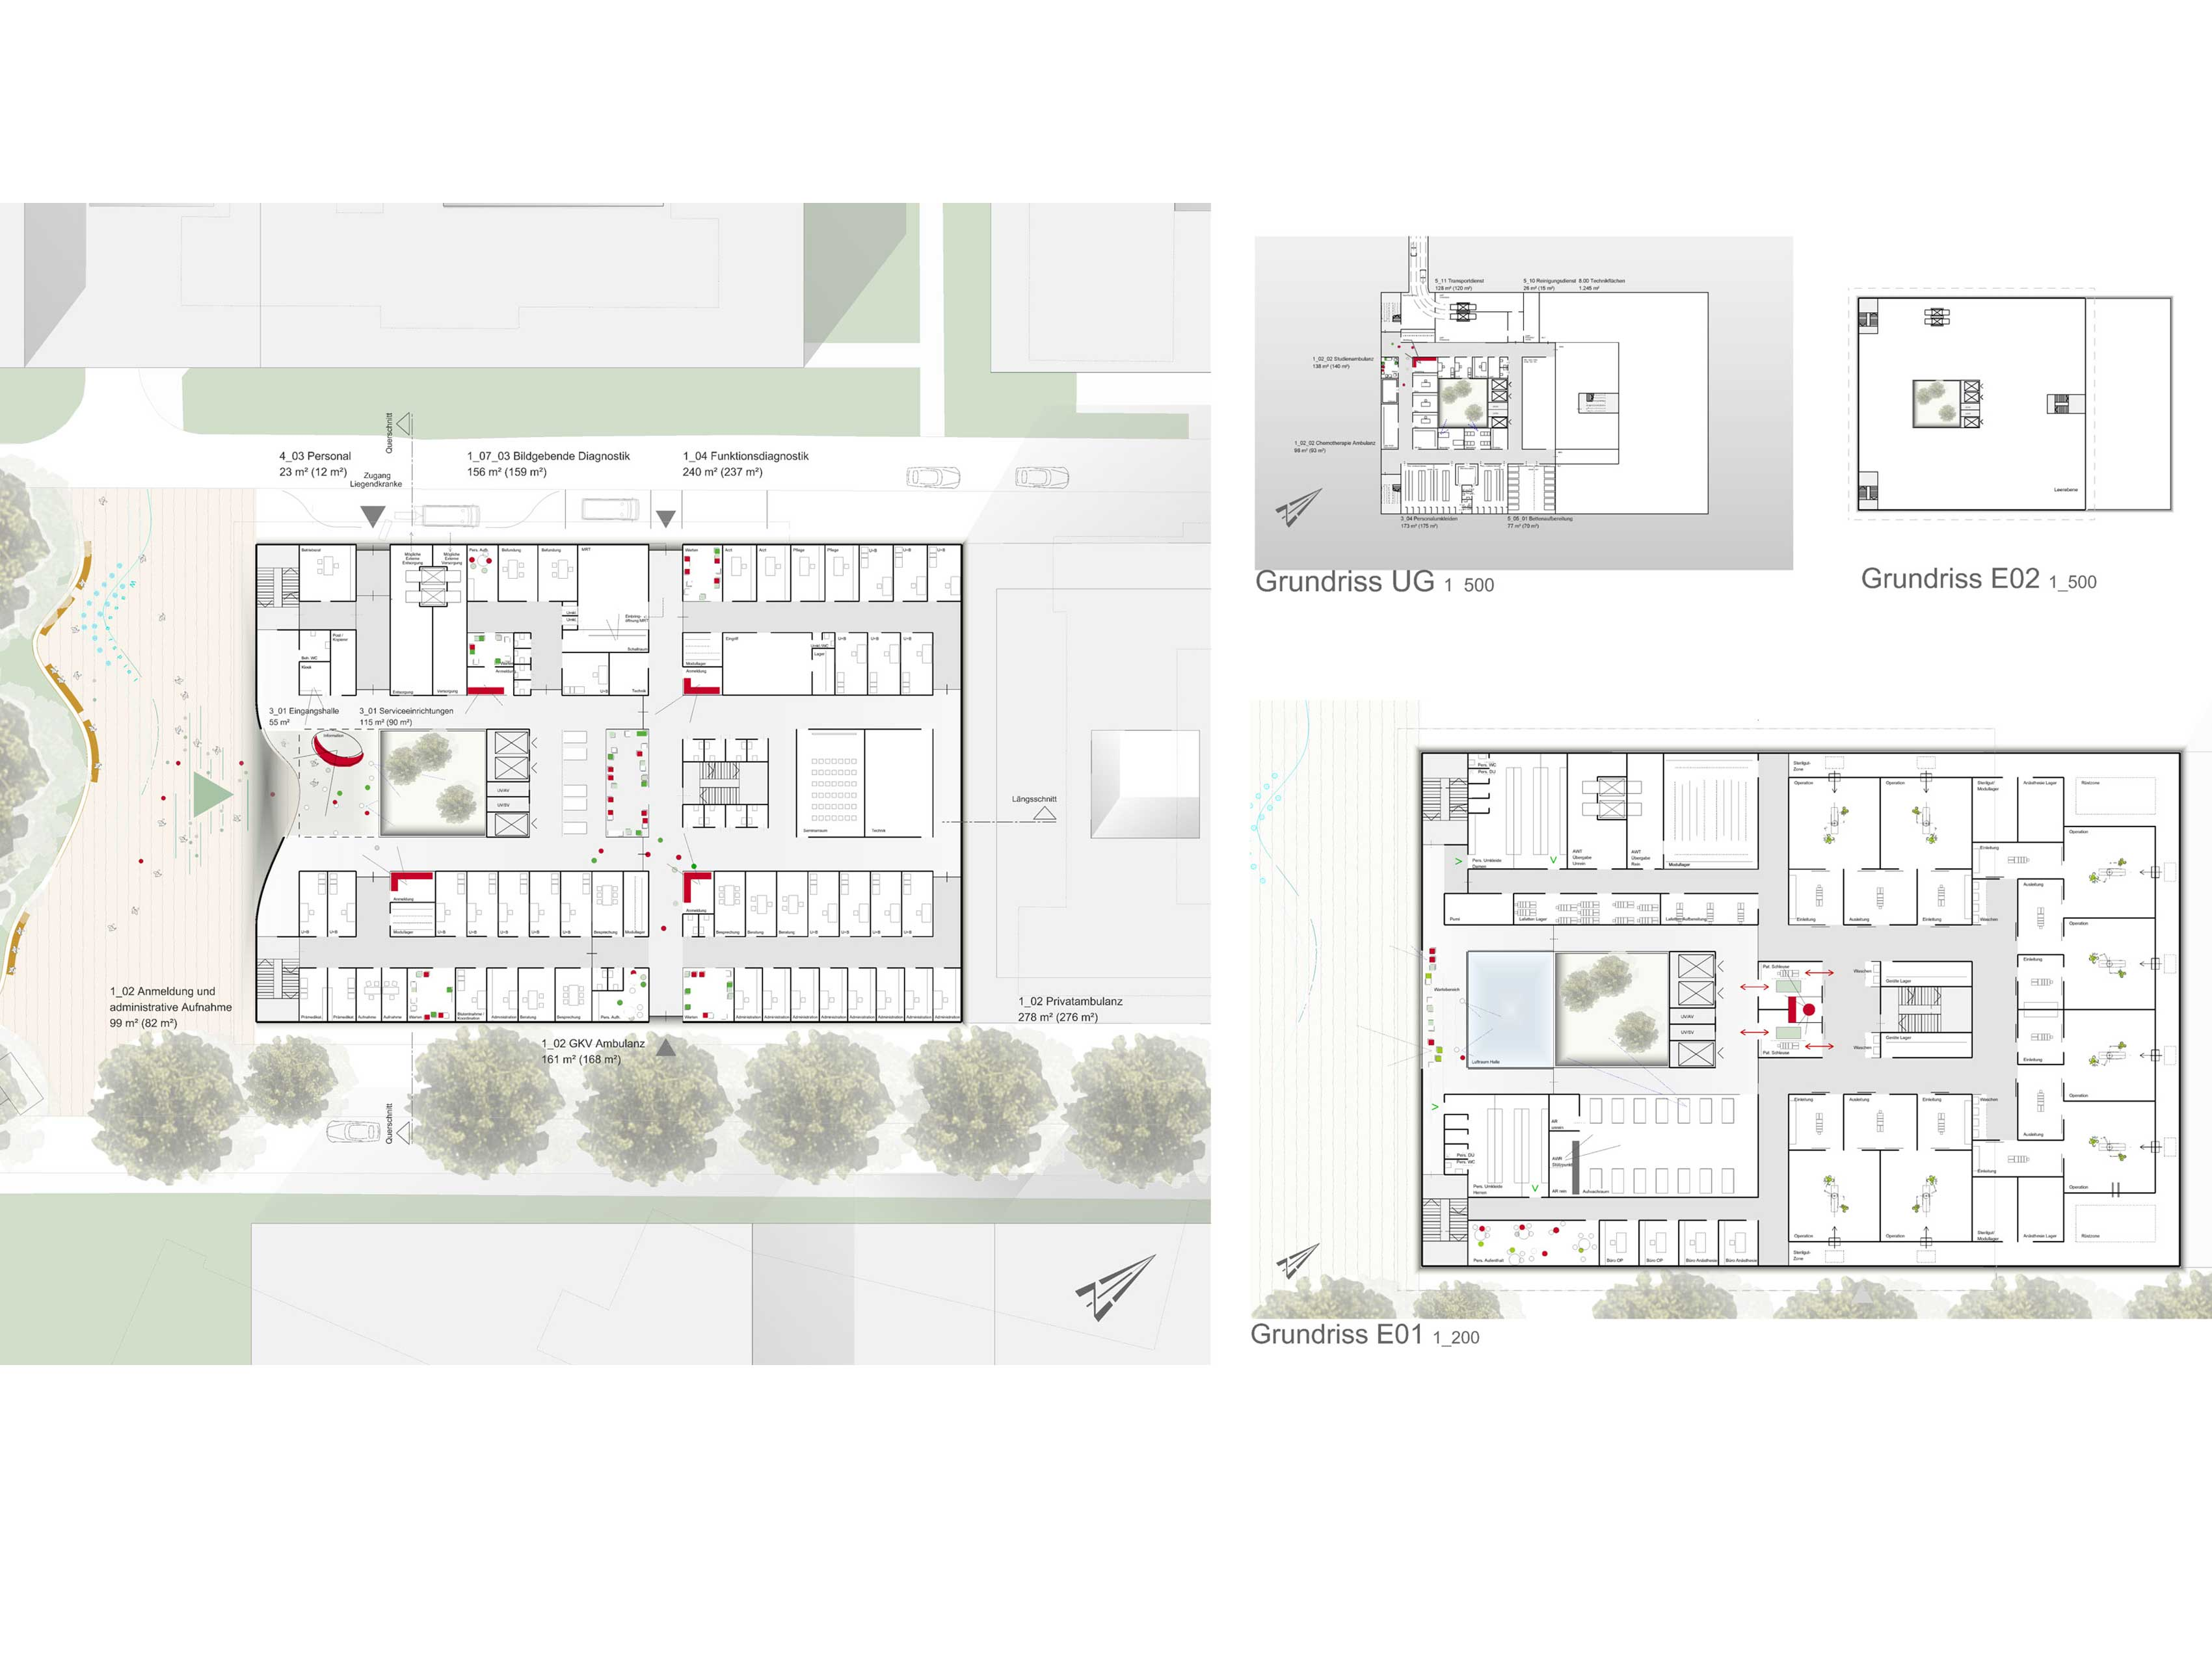 Neubau der Martini-Klinik Lageplan / Grundrisse